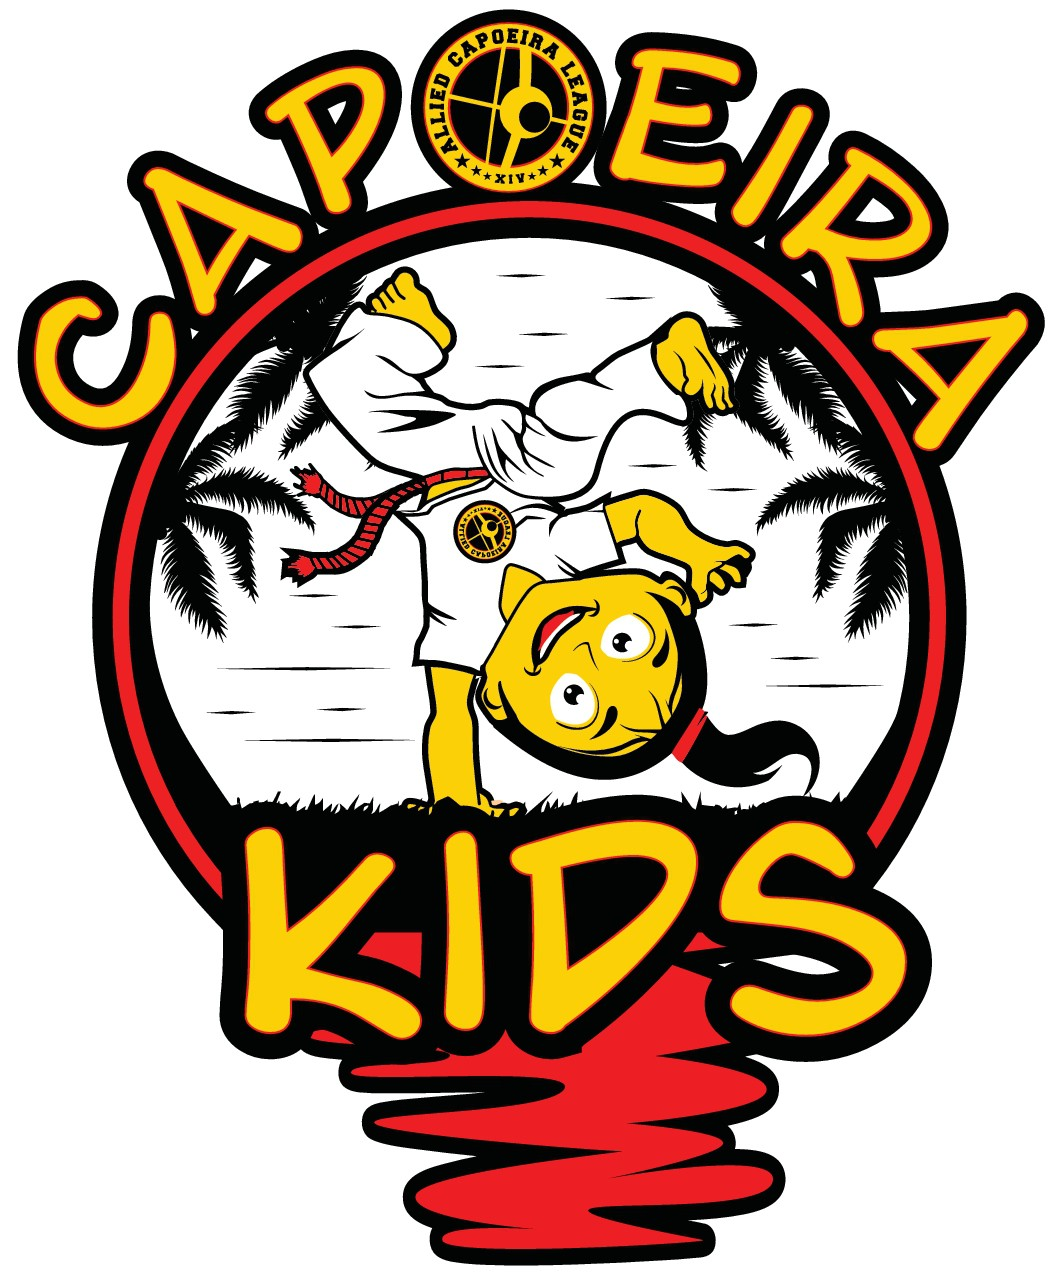 Capoeira martial arts school needs fun kids design!